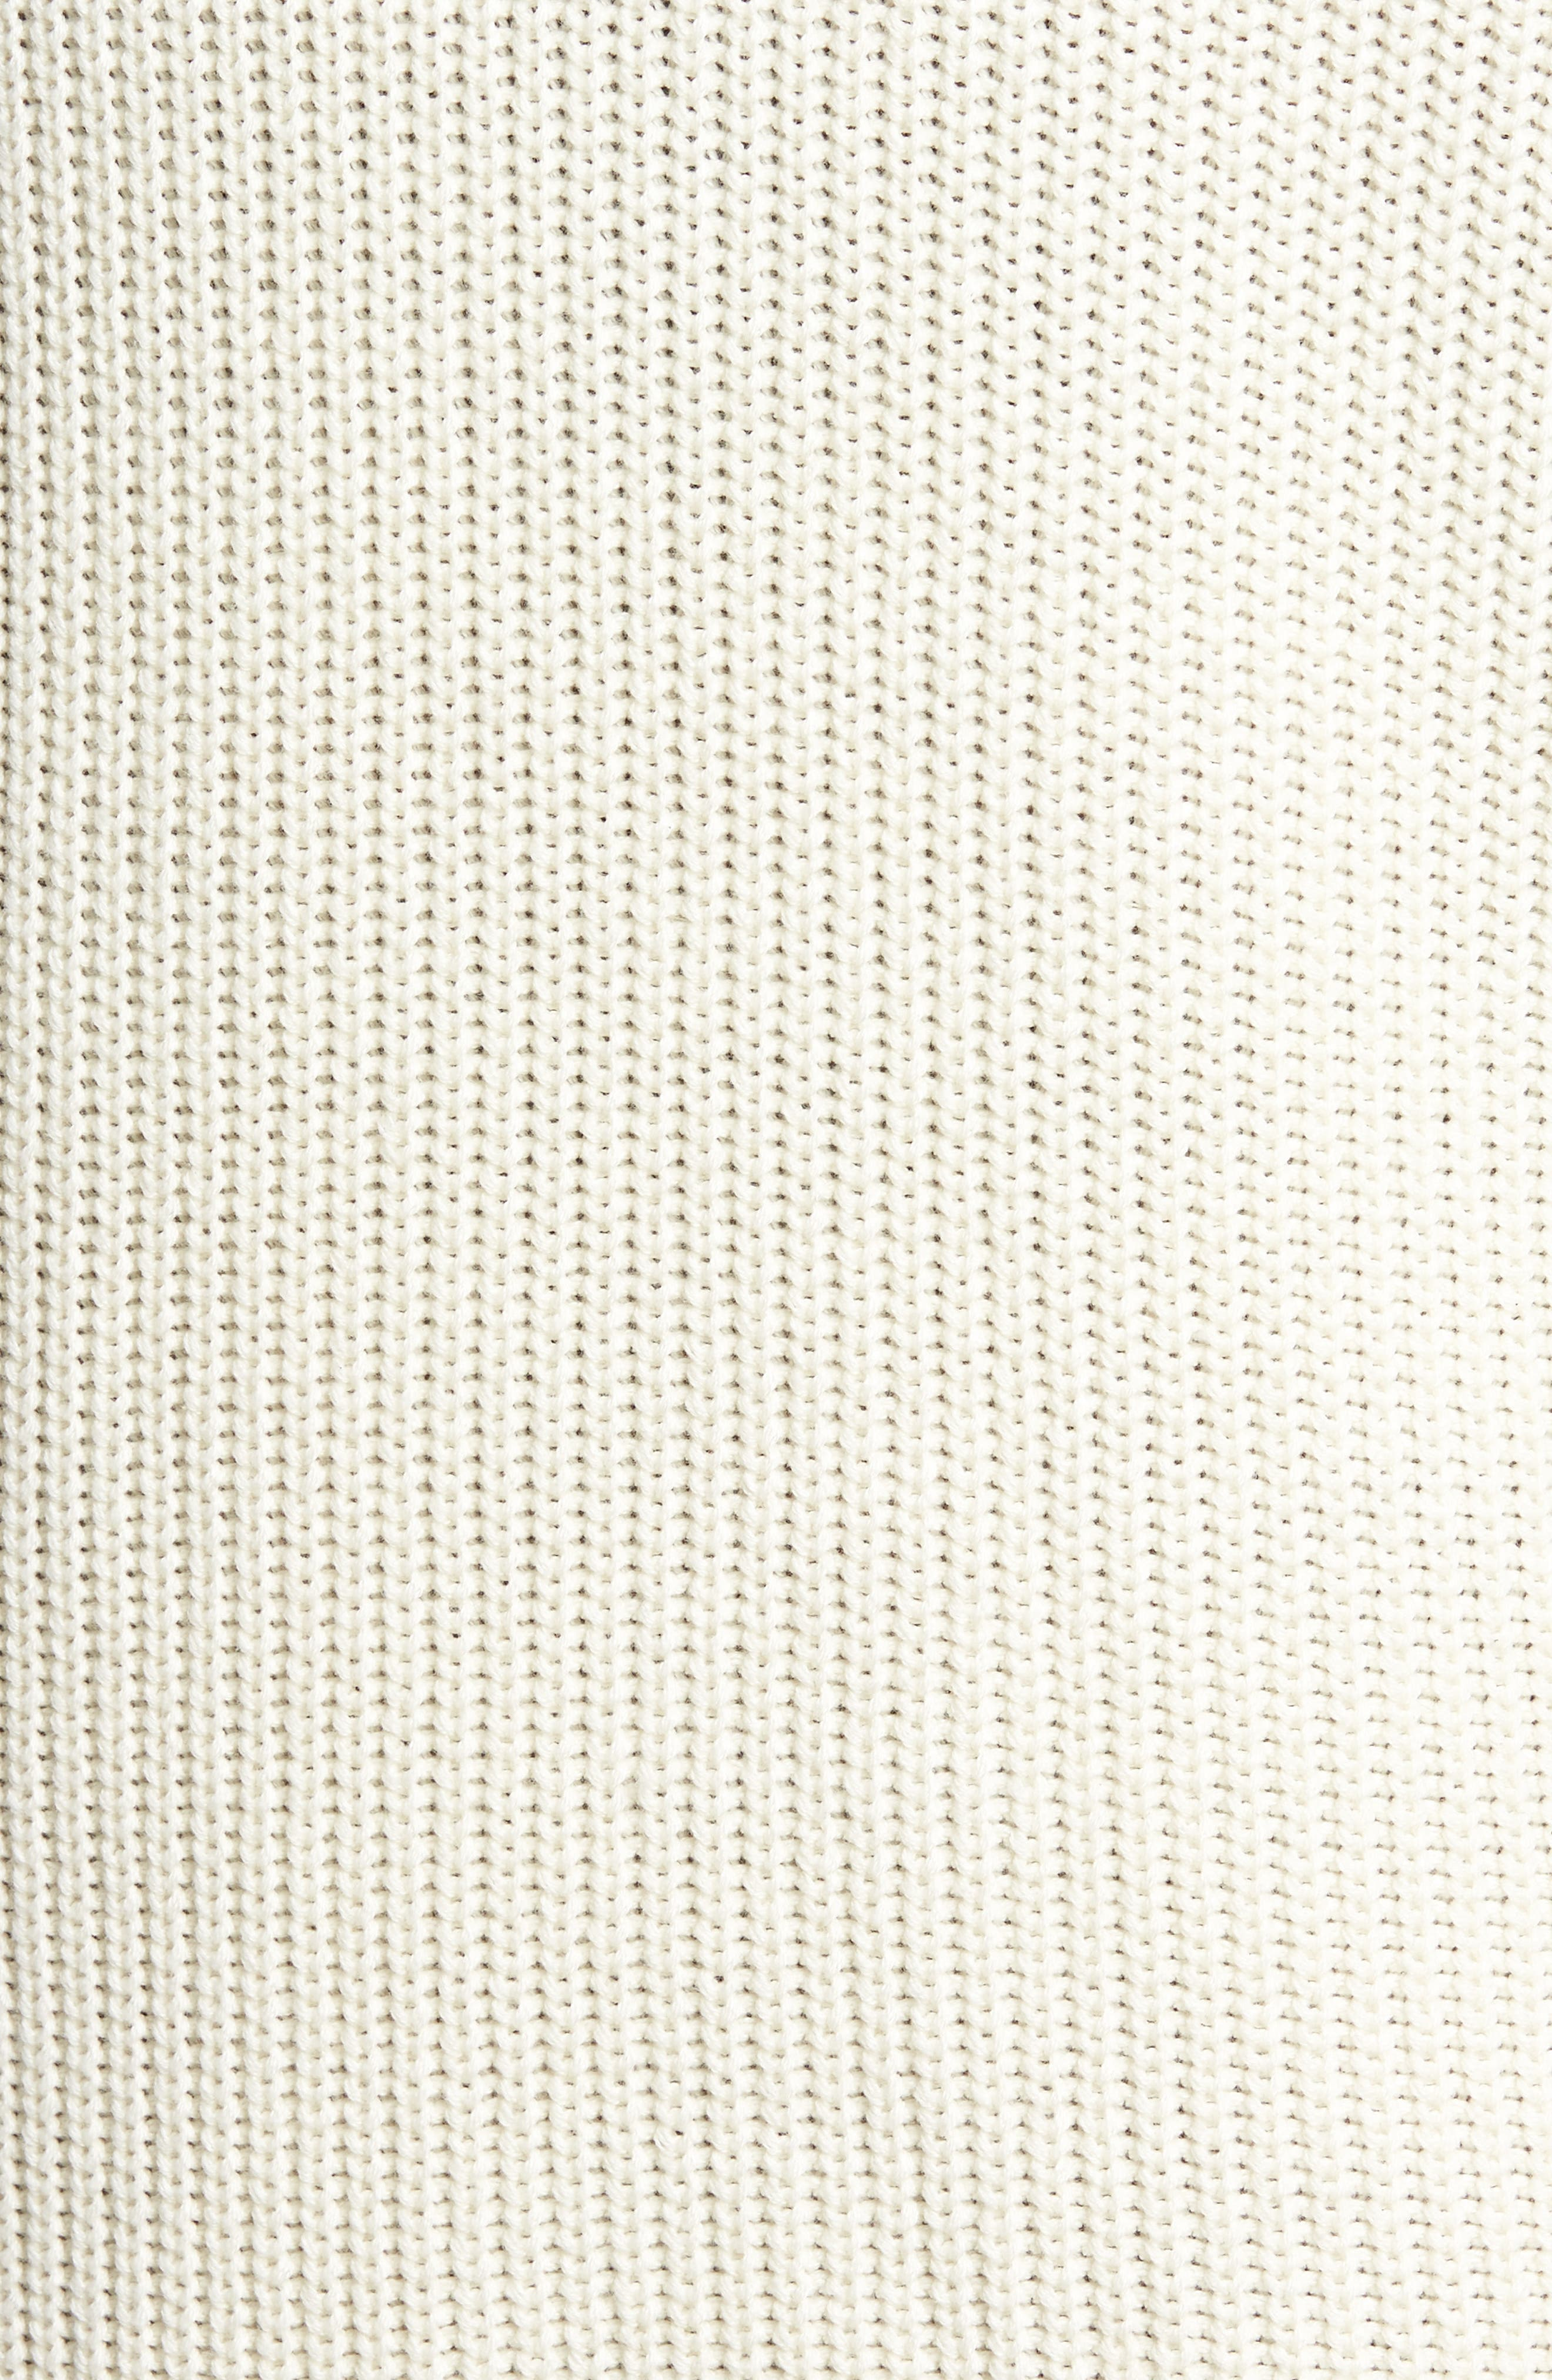 Shaker Stitch Sweater,                             Alternate thumbnail 10, color,